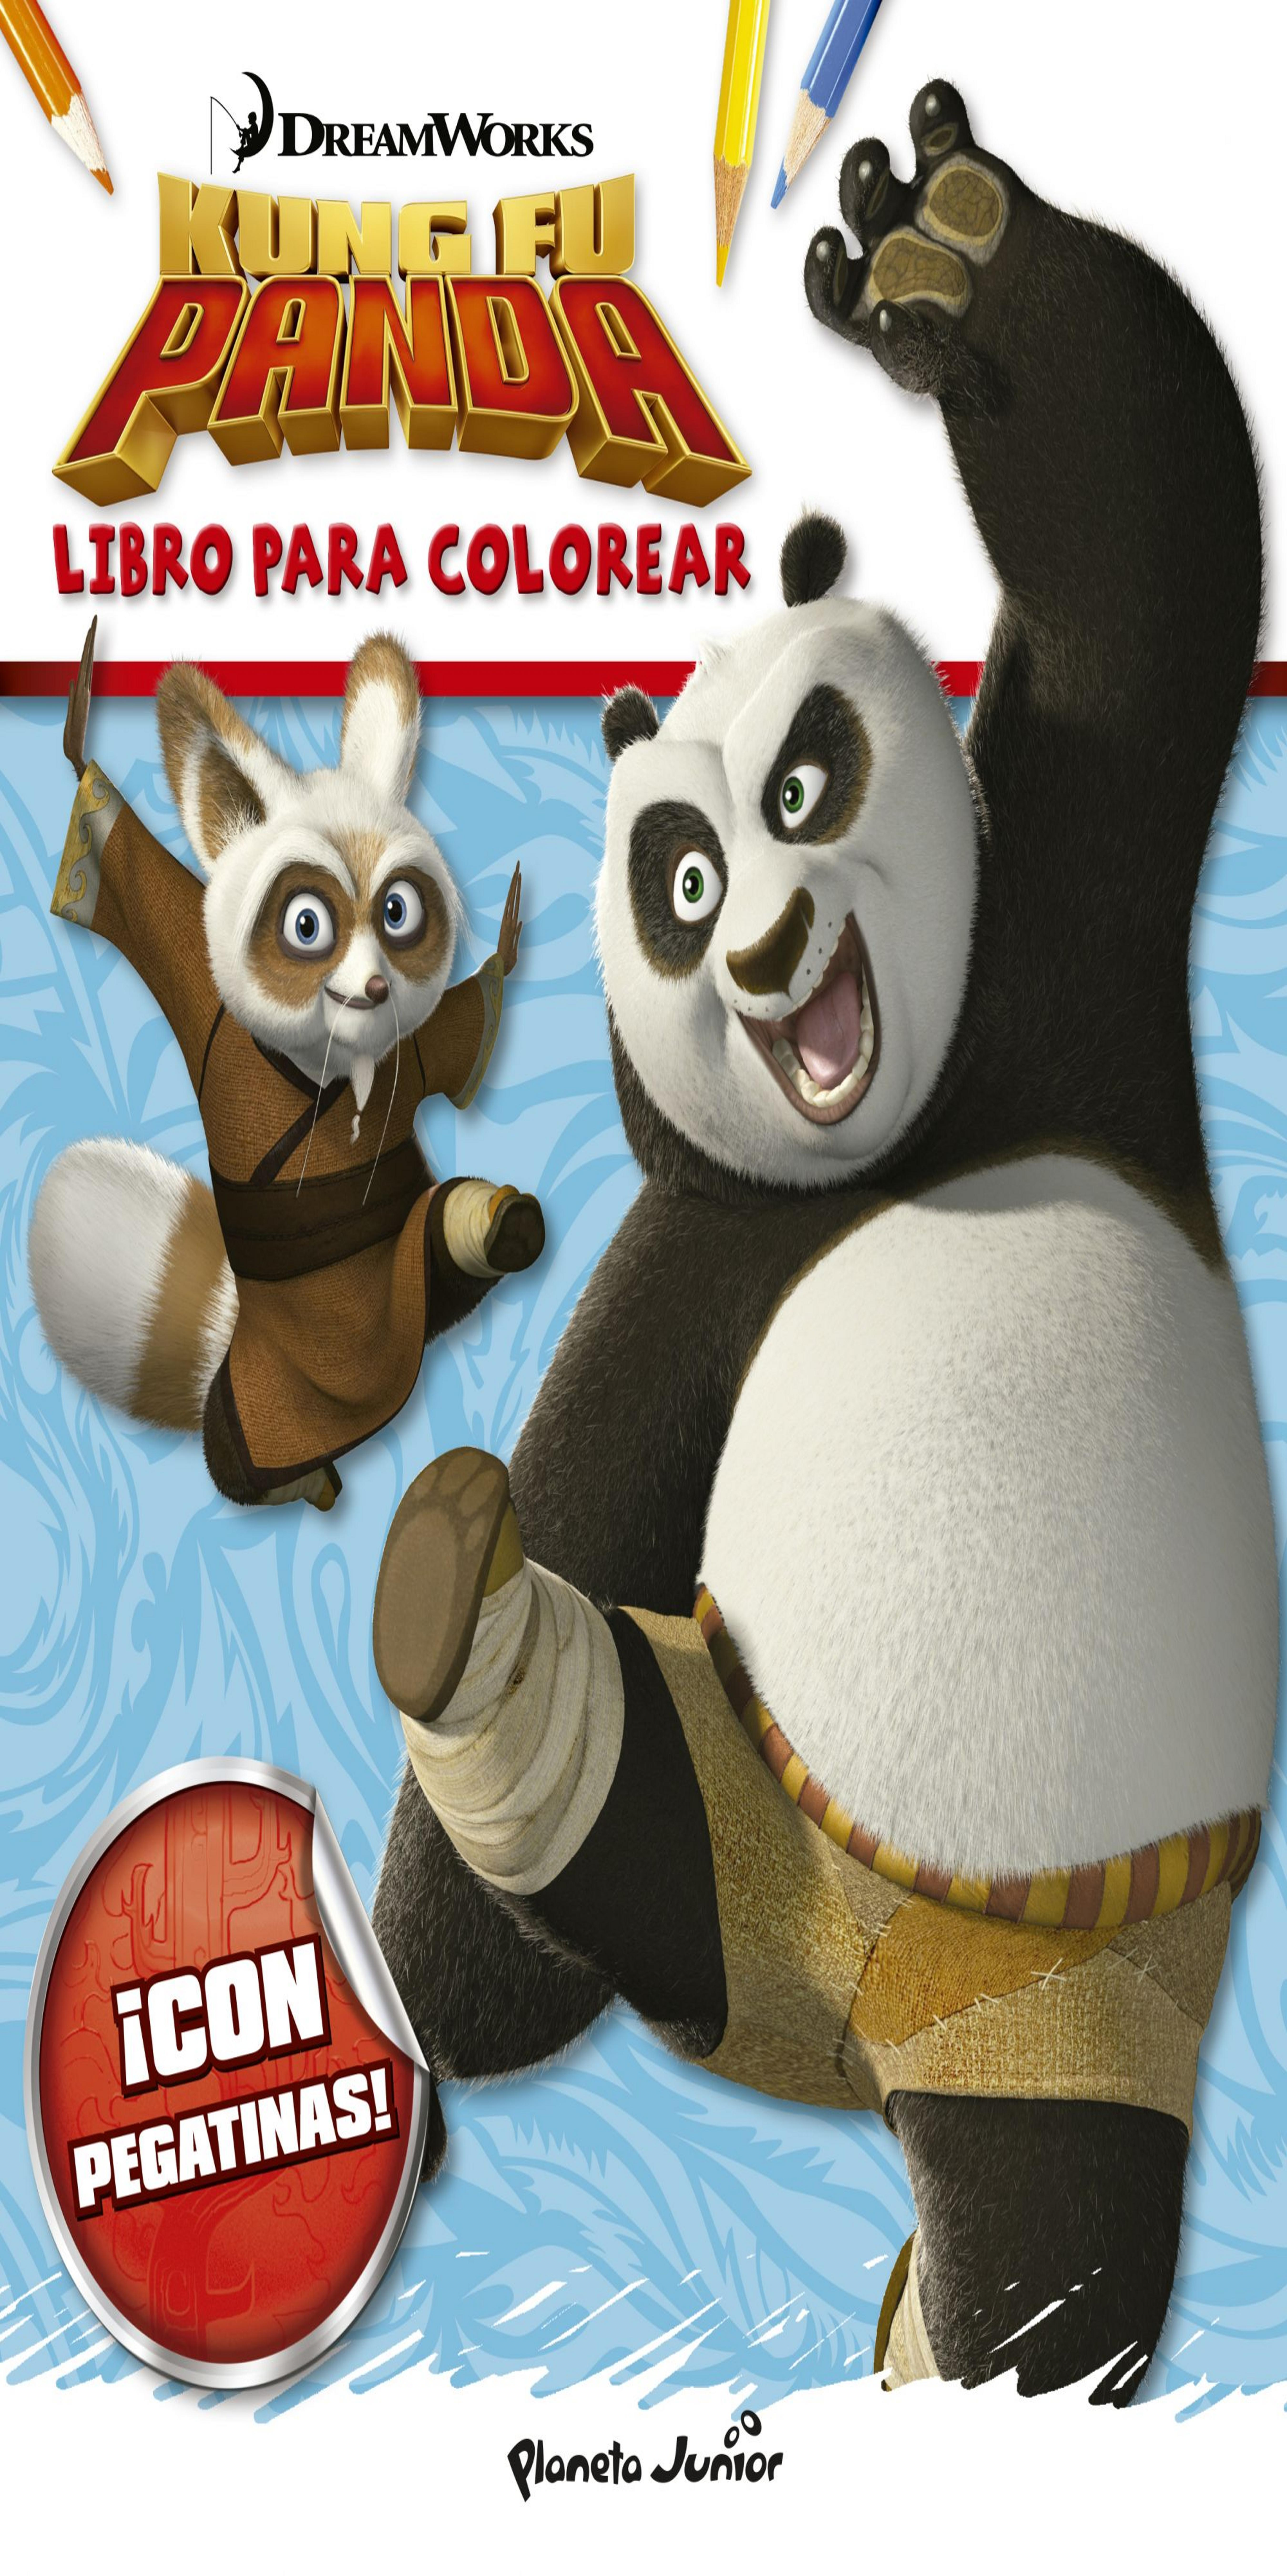 KUNG FU PANDA: LIBRO PARA COLOREAR